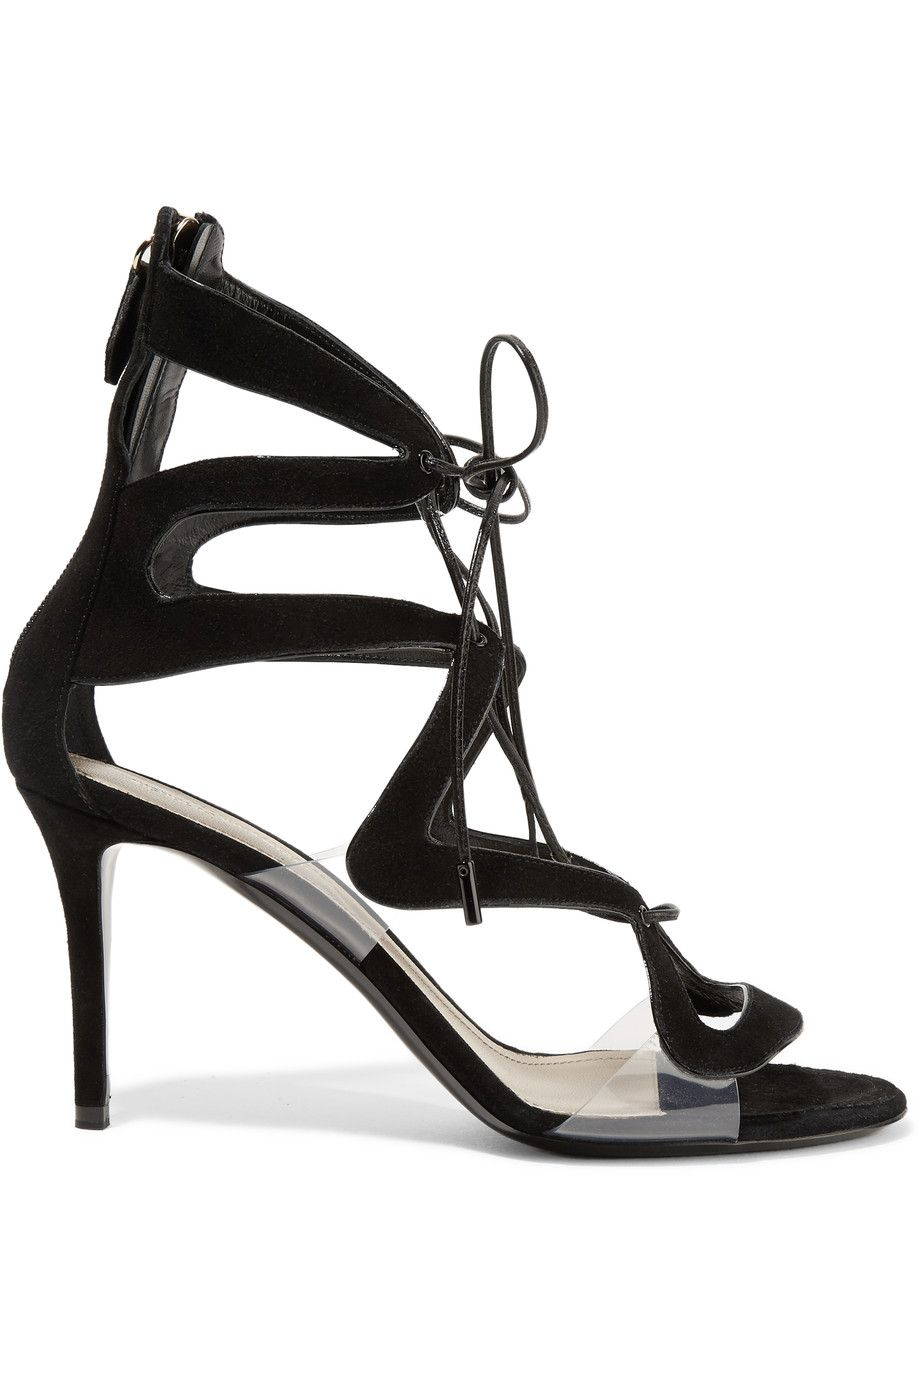 NICHOLAS KIRKWOOD Serafin Pvc-Trimmed Suede Sandals. #nicholaskirkwood #shoes #sandals